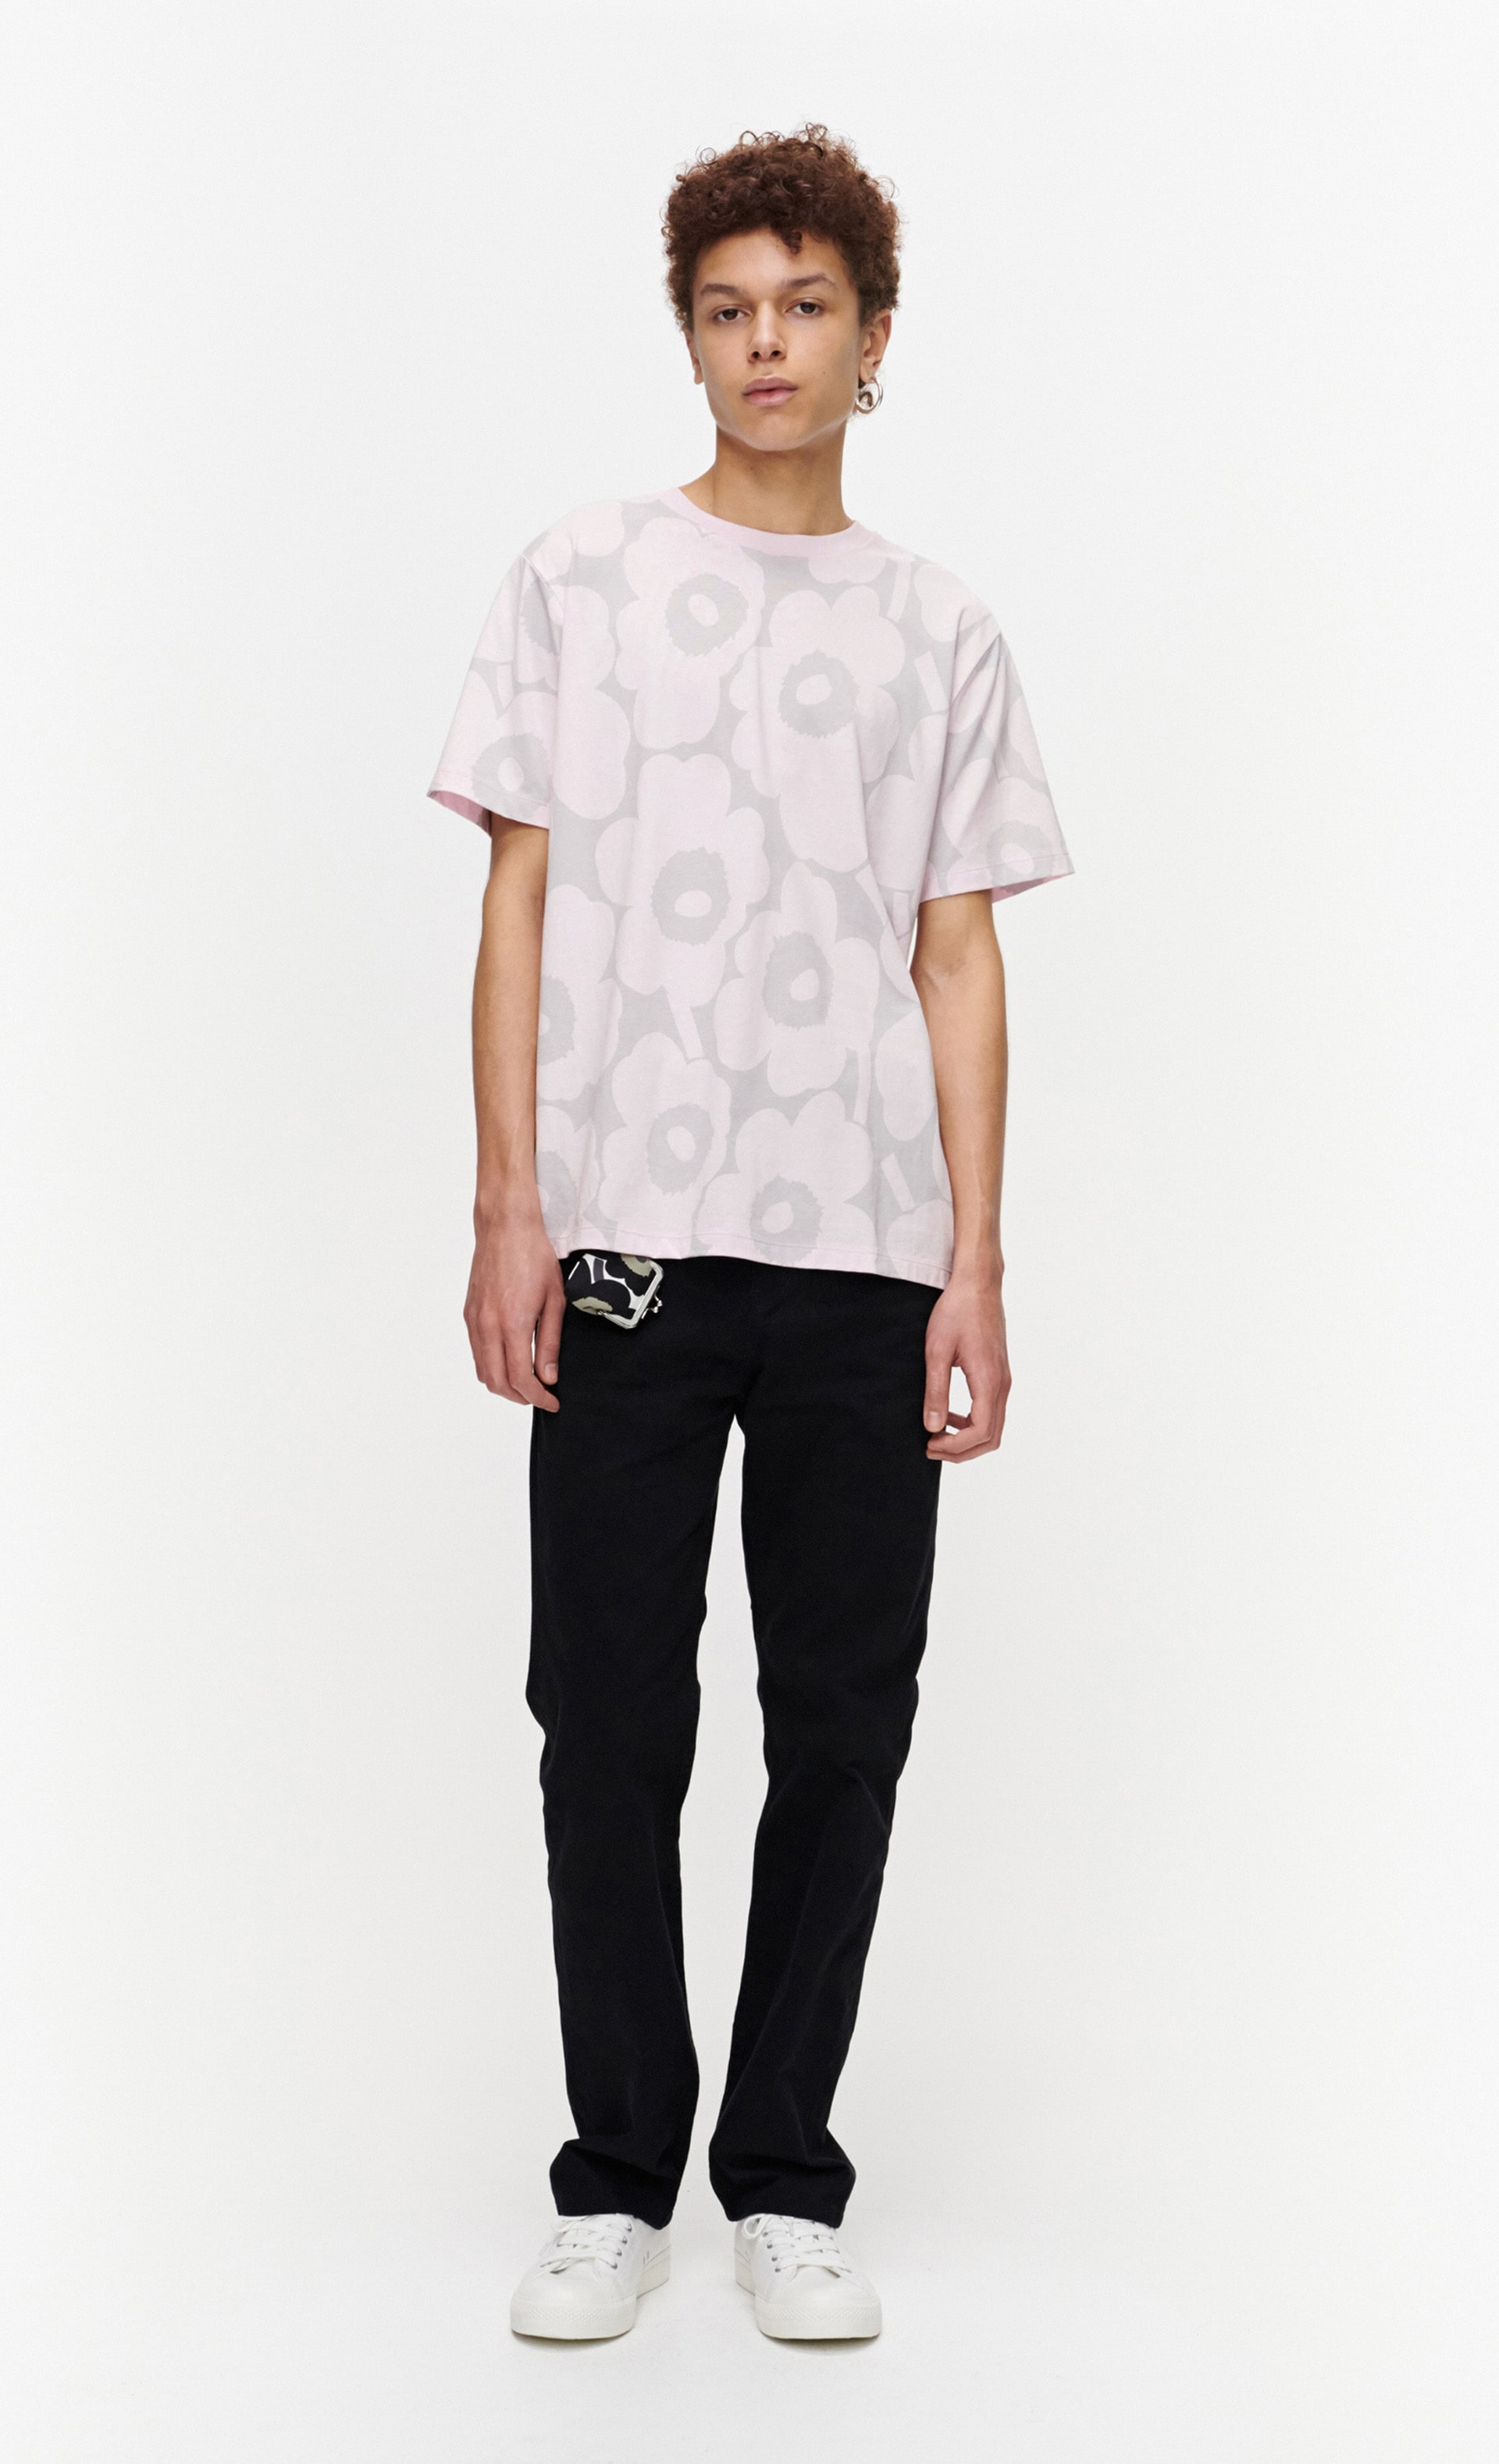 Hiekka Pieni Unikko Tシャツ